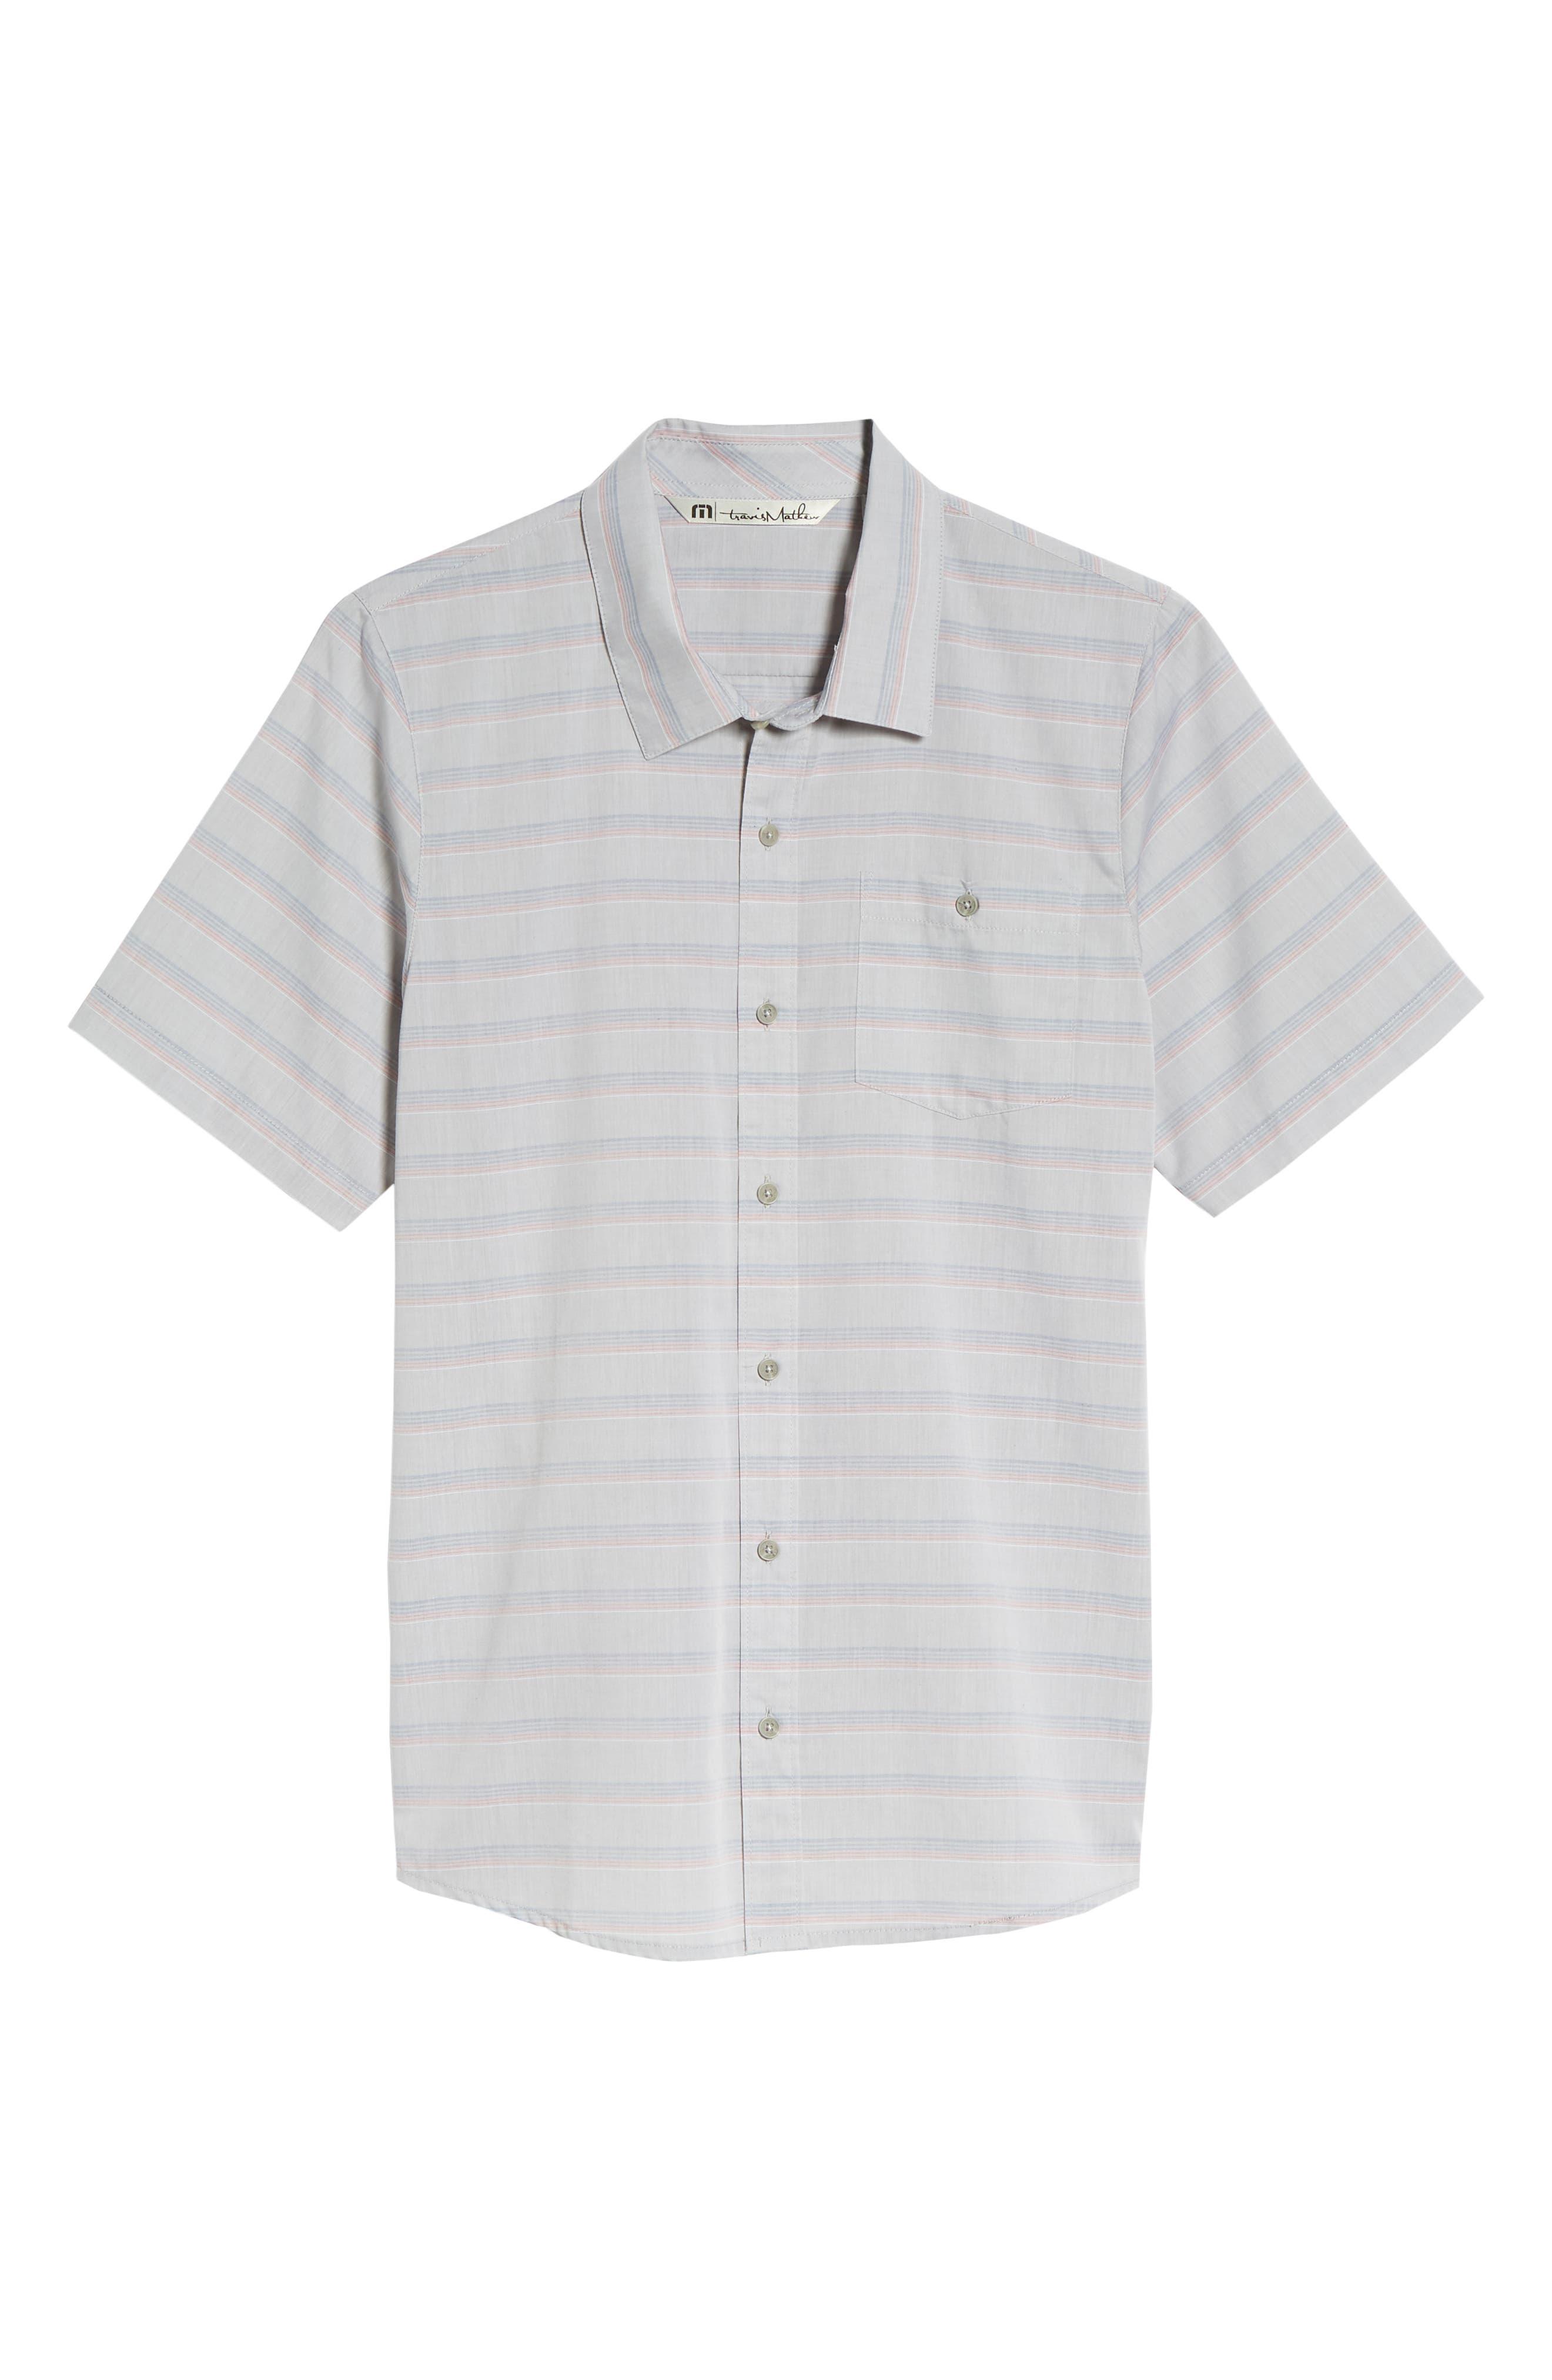 Comet Regular Fit Short Sleeve Sport Shirt,                             Alternate thumbnail 6, color,                             Heather Sharkskin